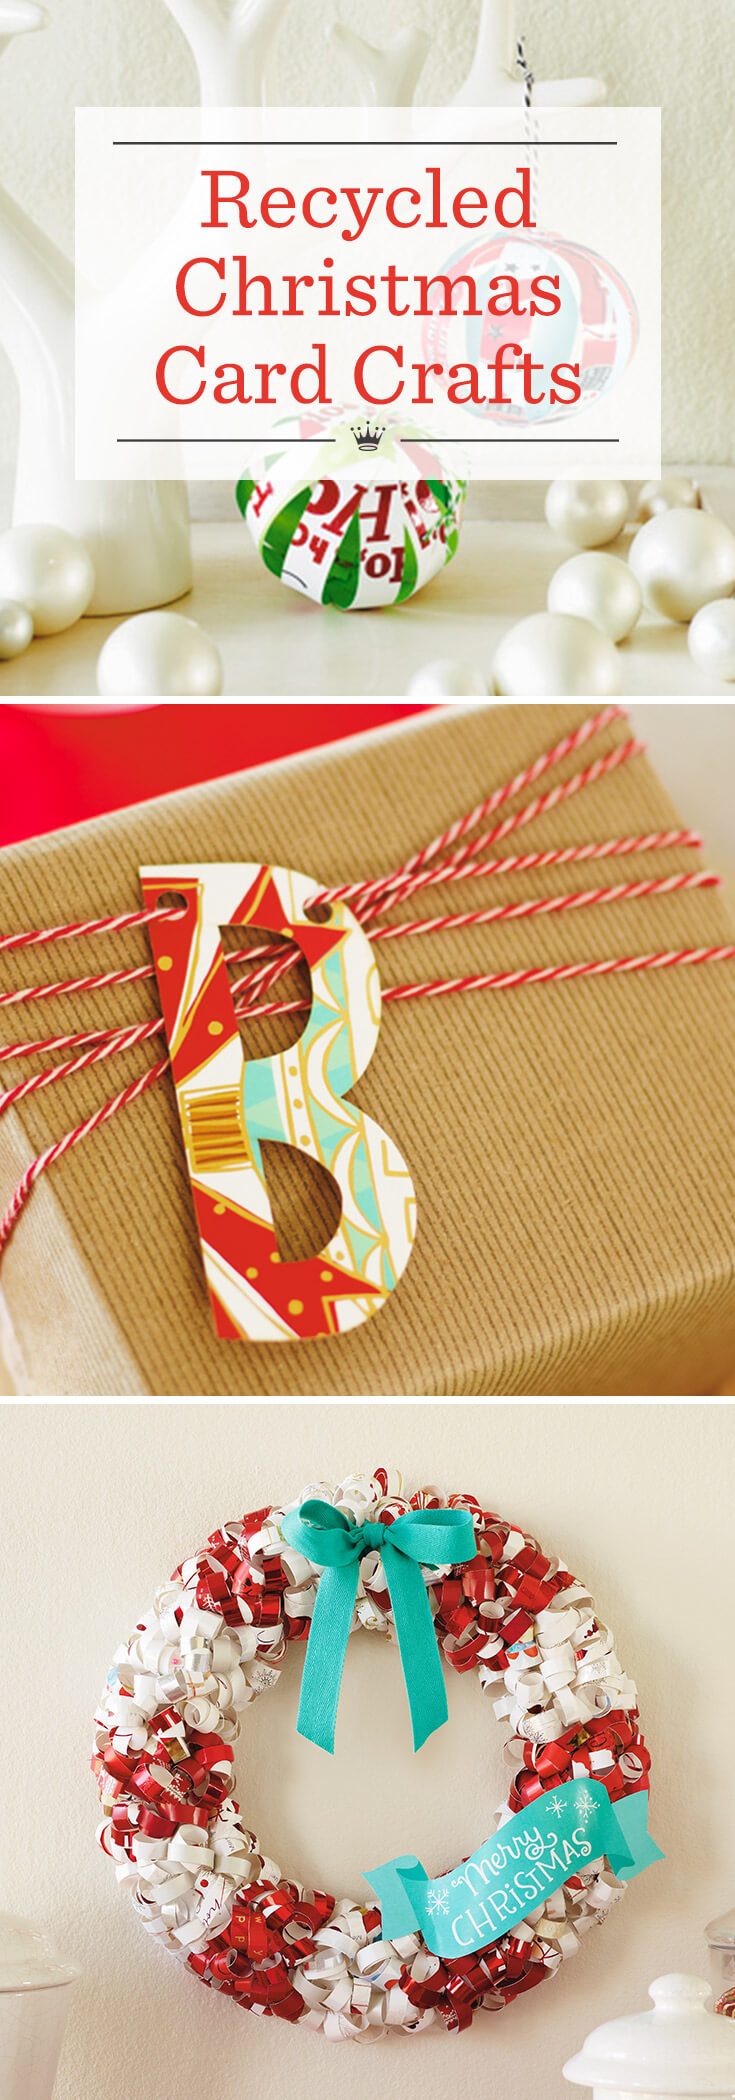 Christmas Card Crafts | Hallmark Ideas & Inspiration